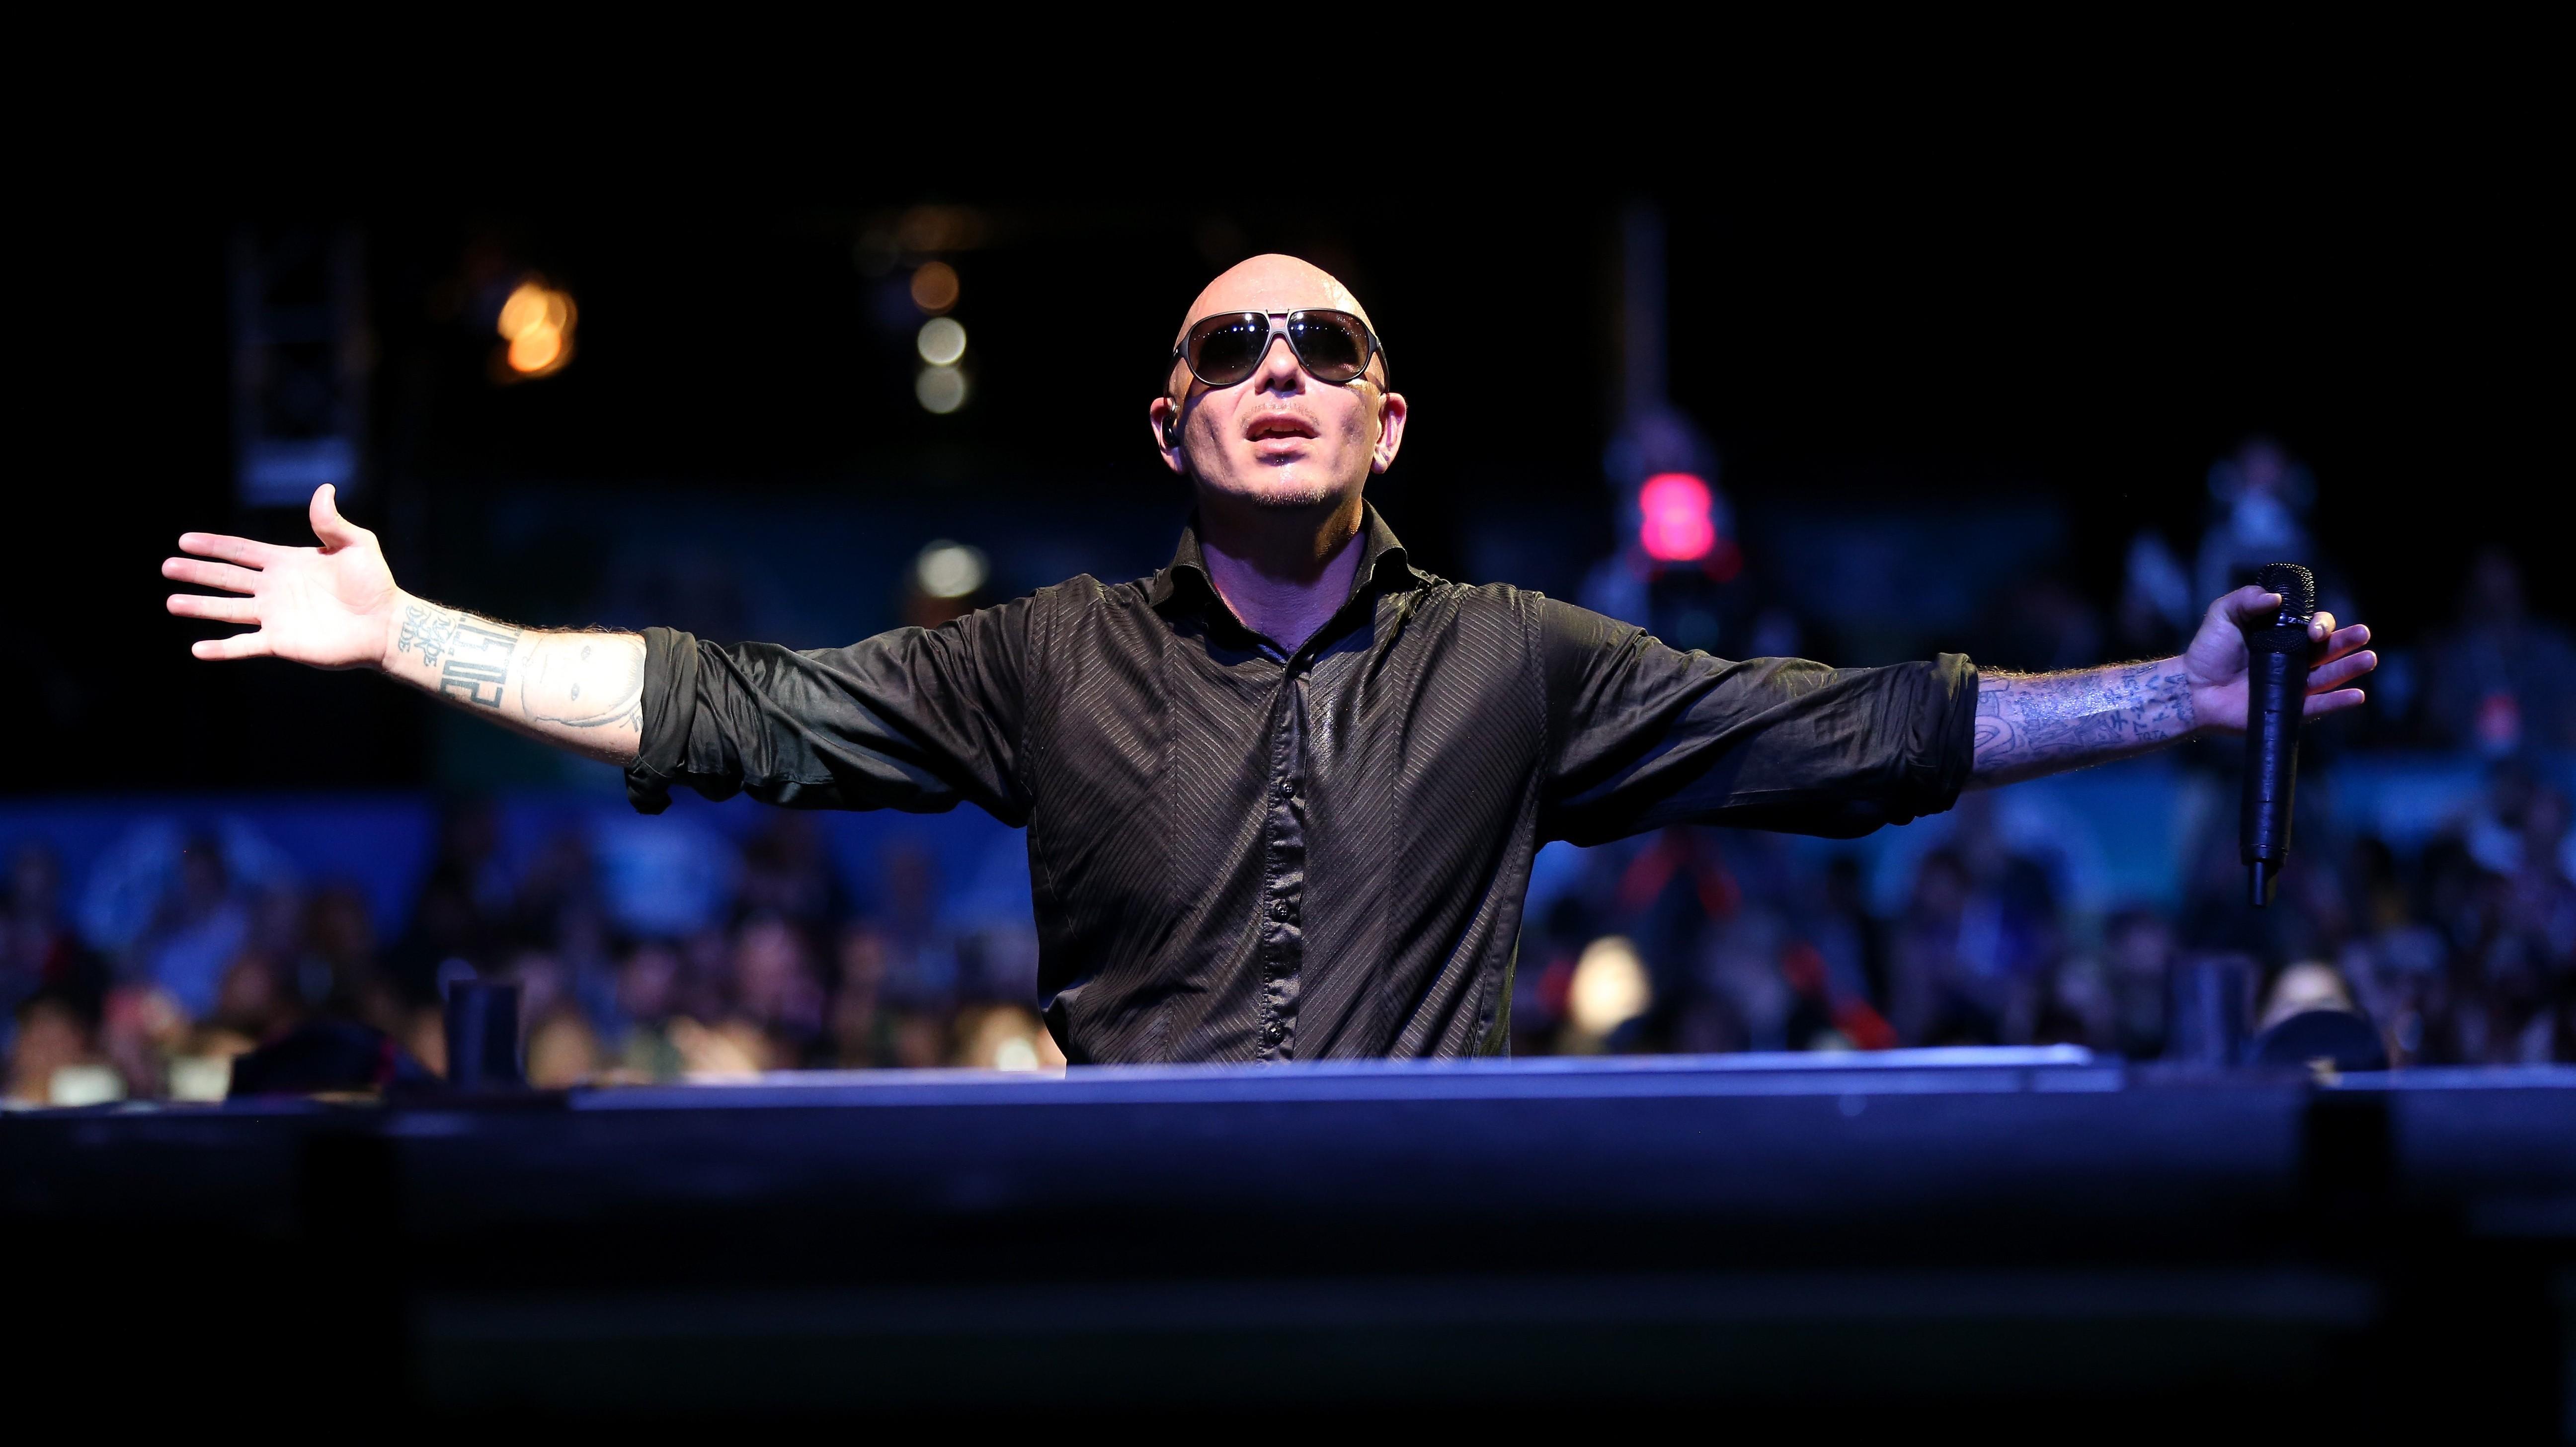 Wallpaper Pitbull Top Music Artist And Bands Singer Rapper